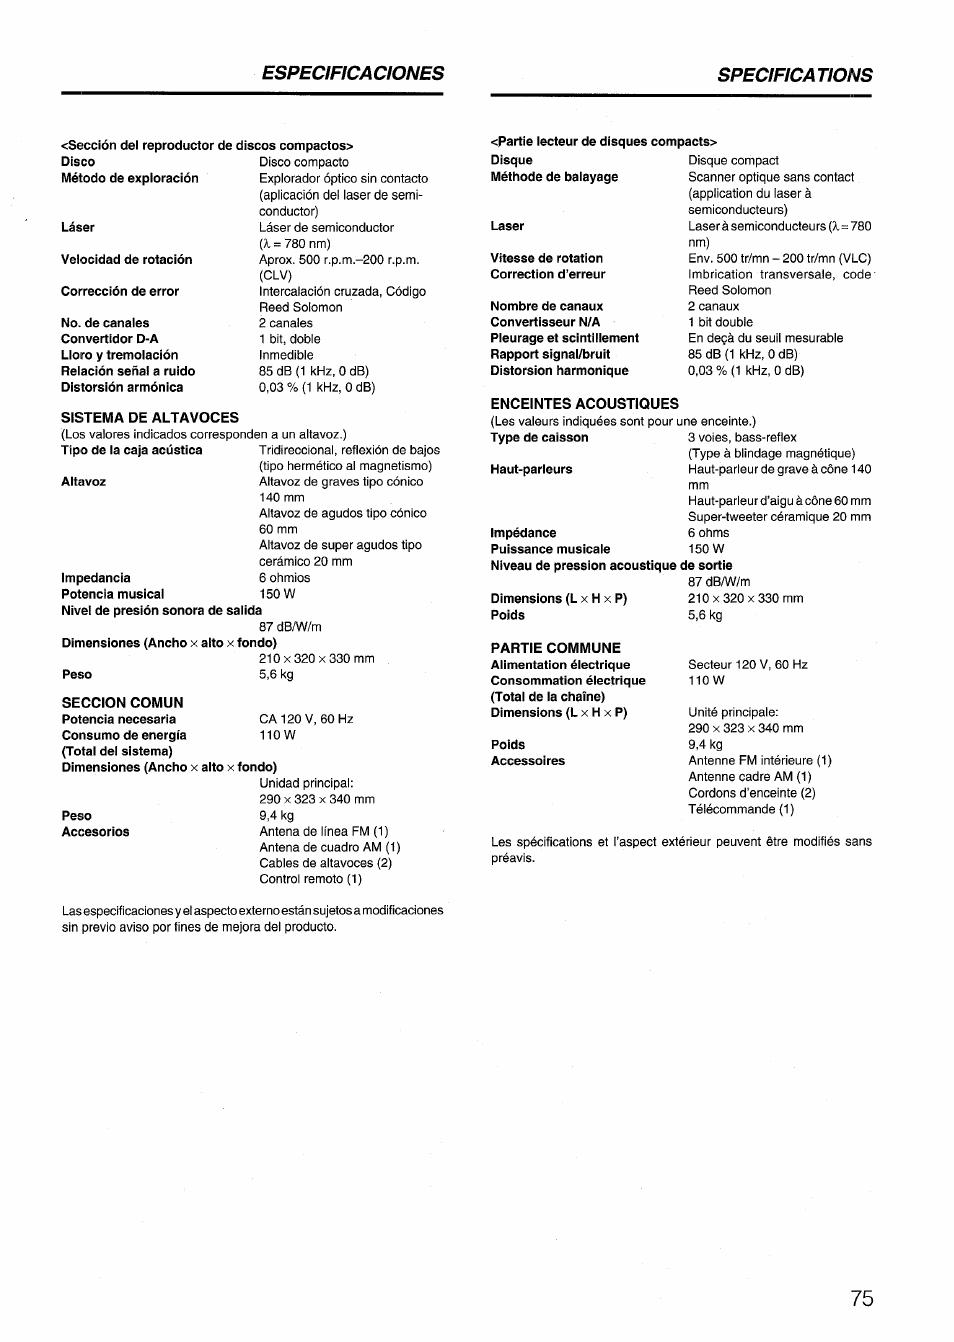 Sistema de altavoces, Seccion comun, Enceintes acoustiques